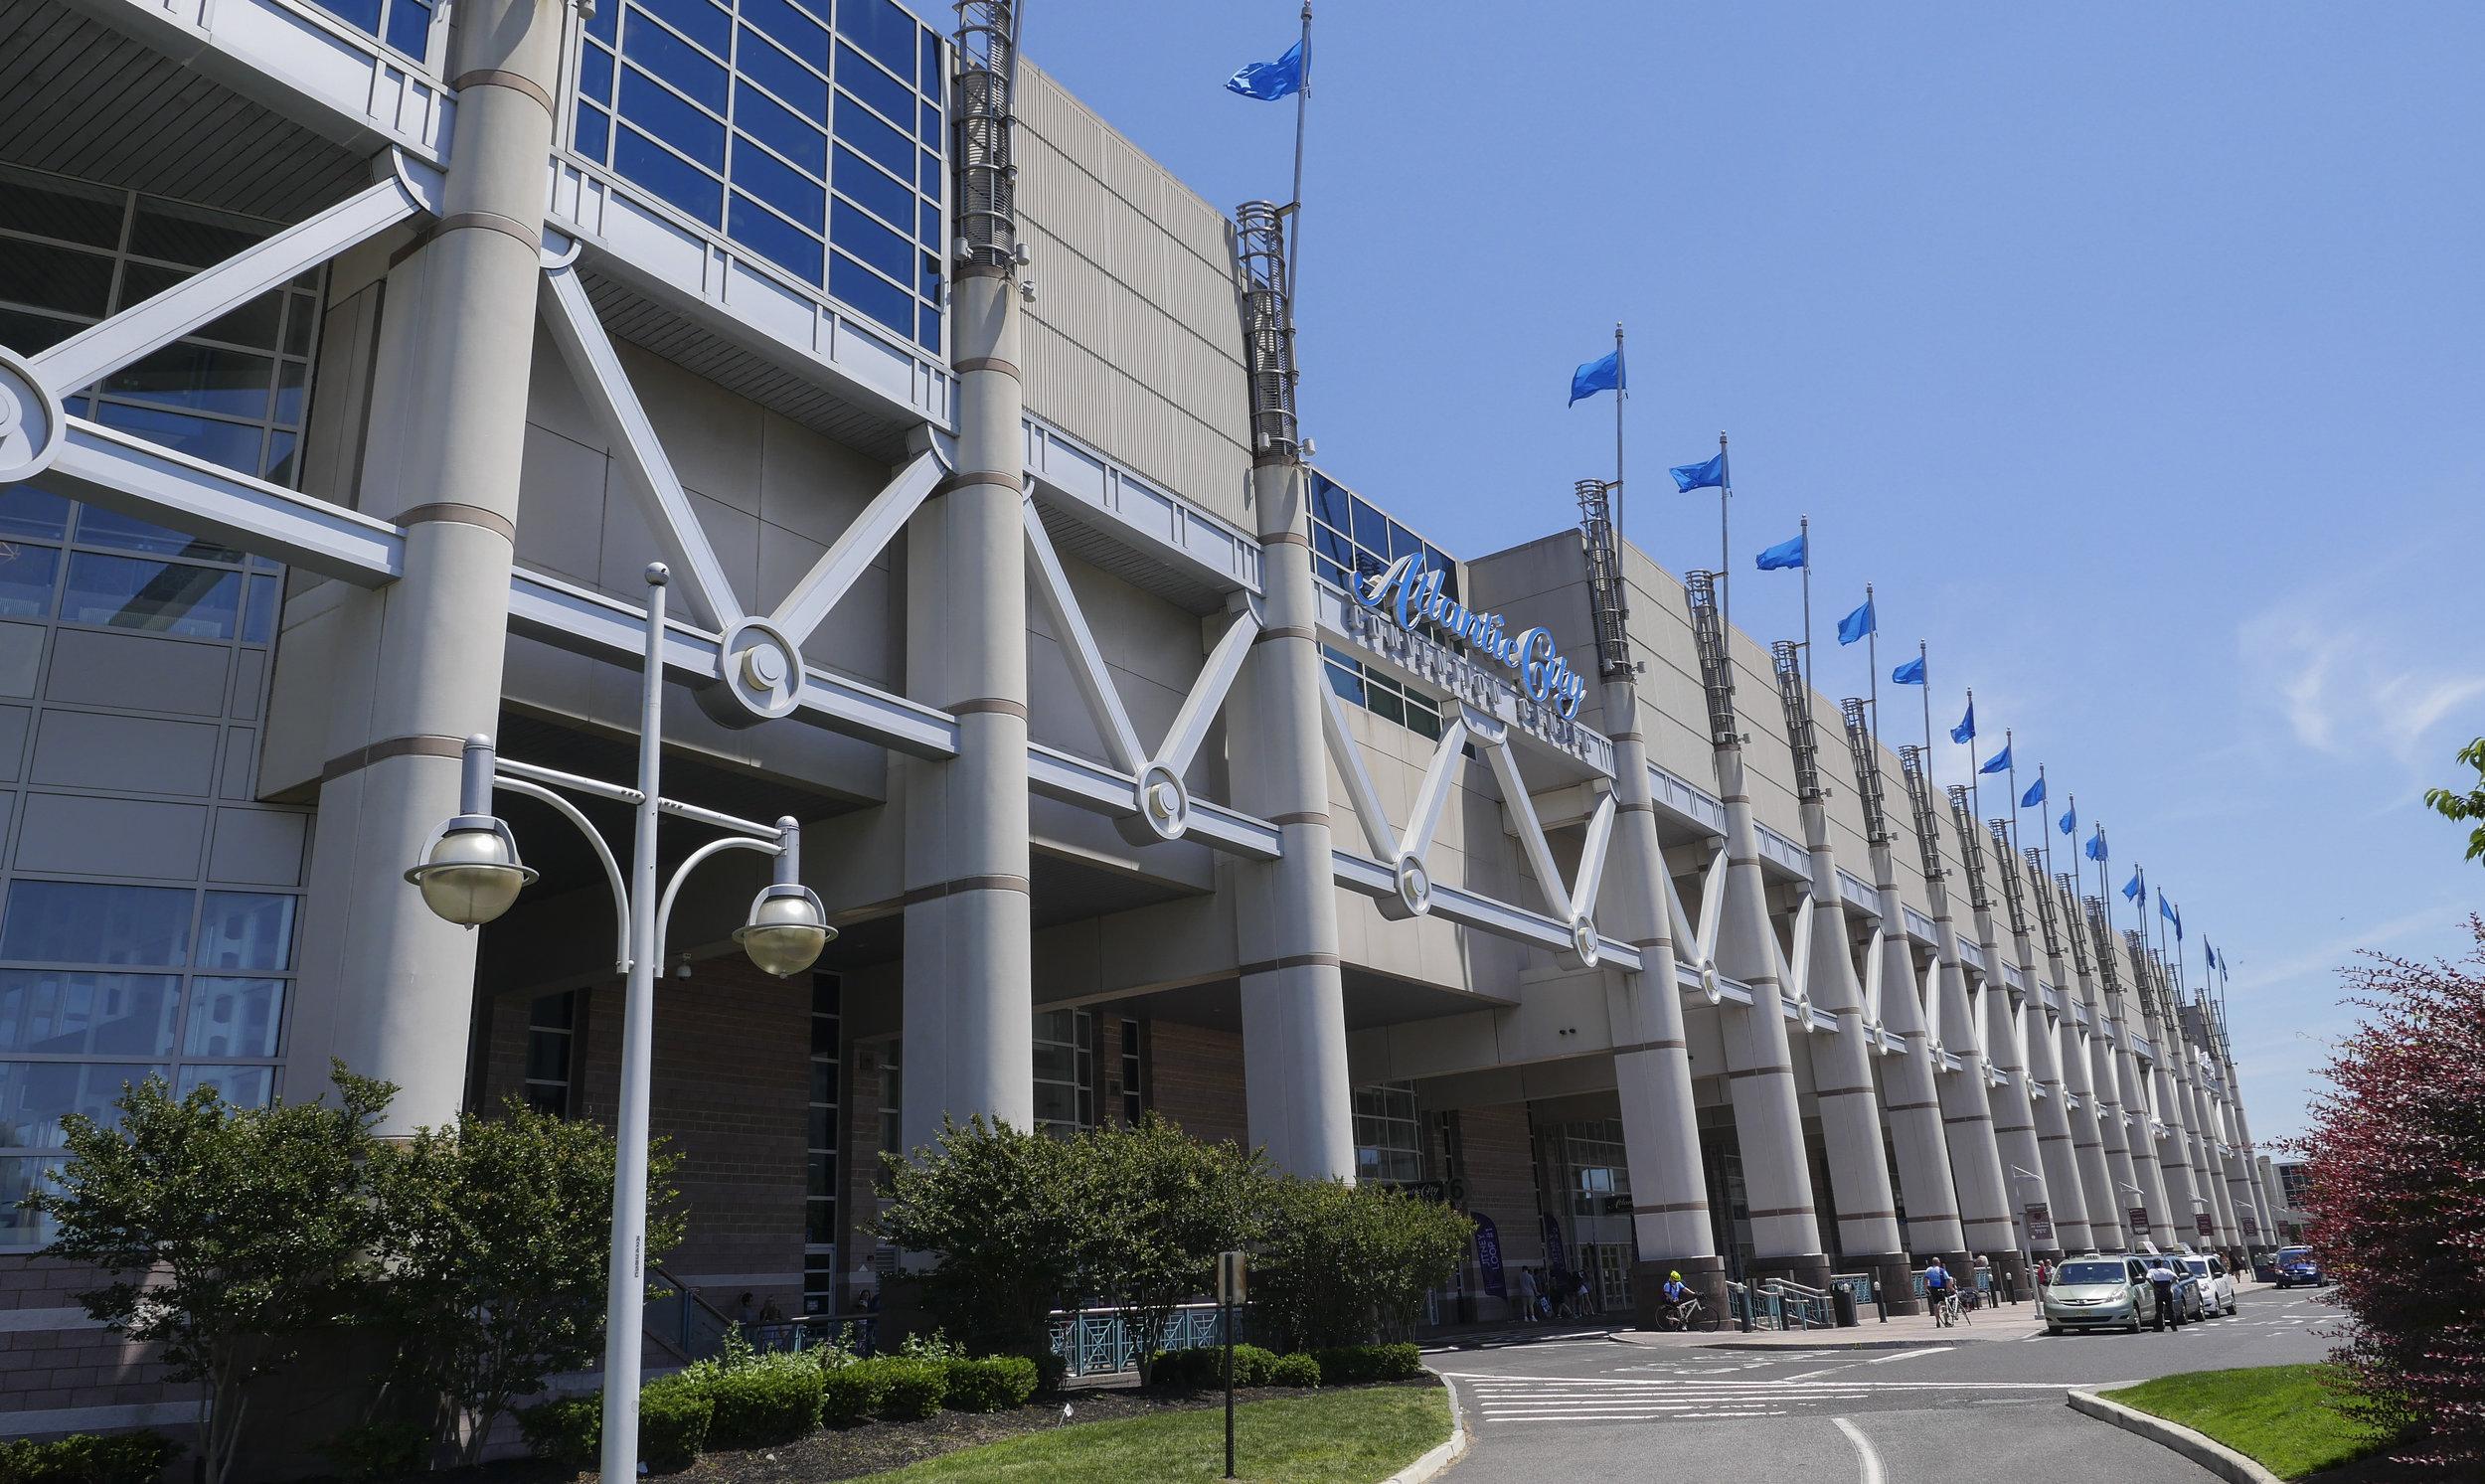 The Atlantic City Convention Center